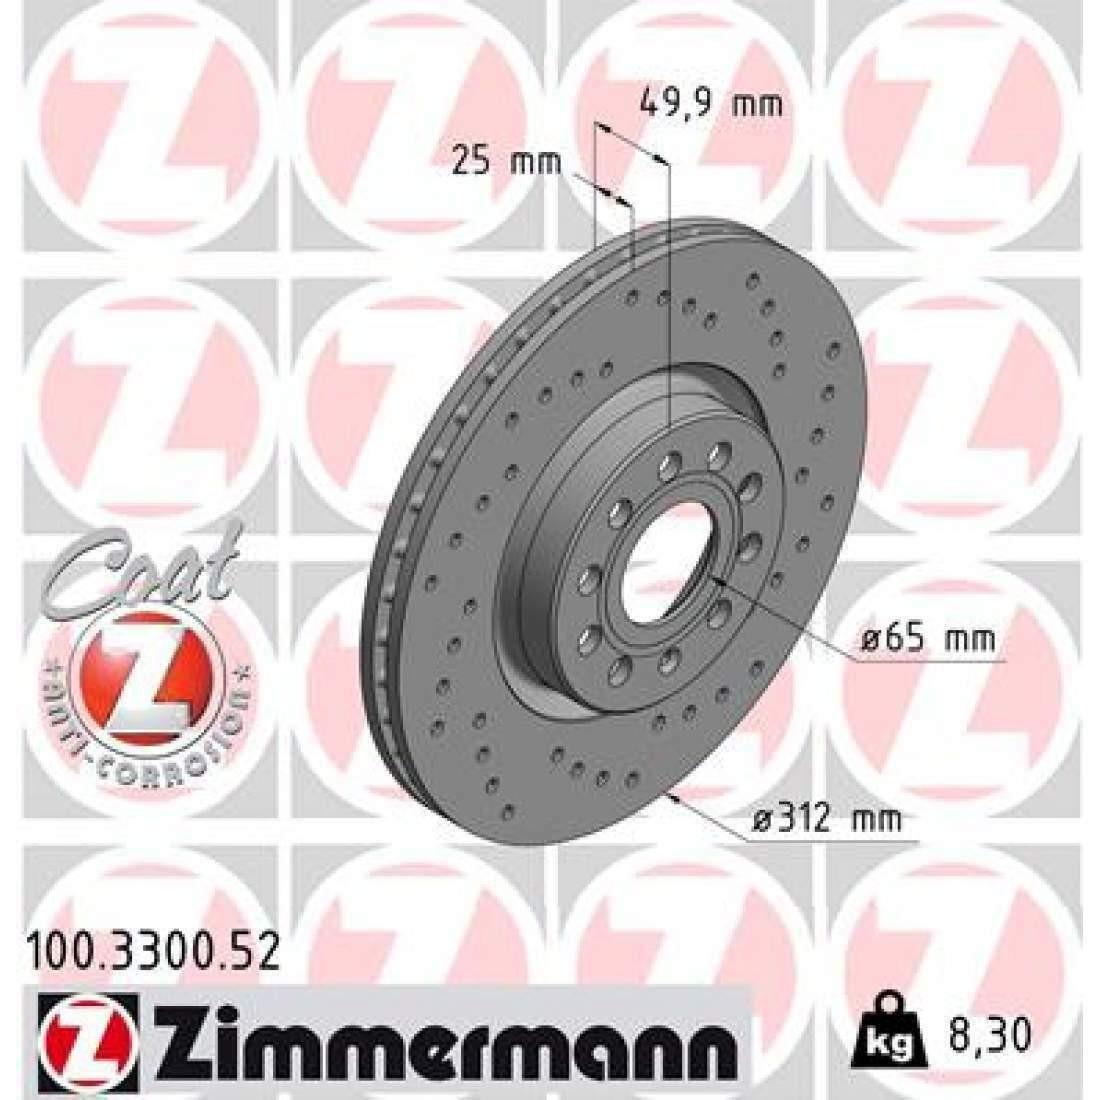 Discuri frana Zimmermann Audi VW Seat Skoda 100.3300.52